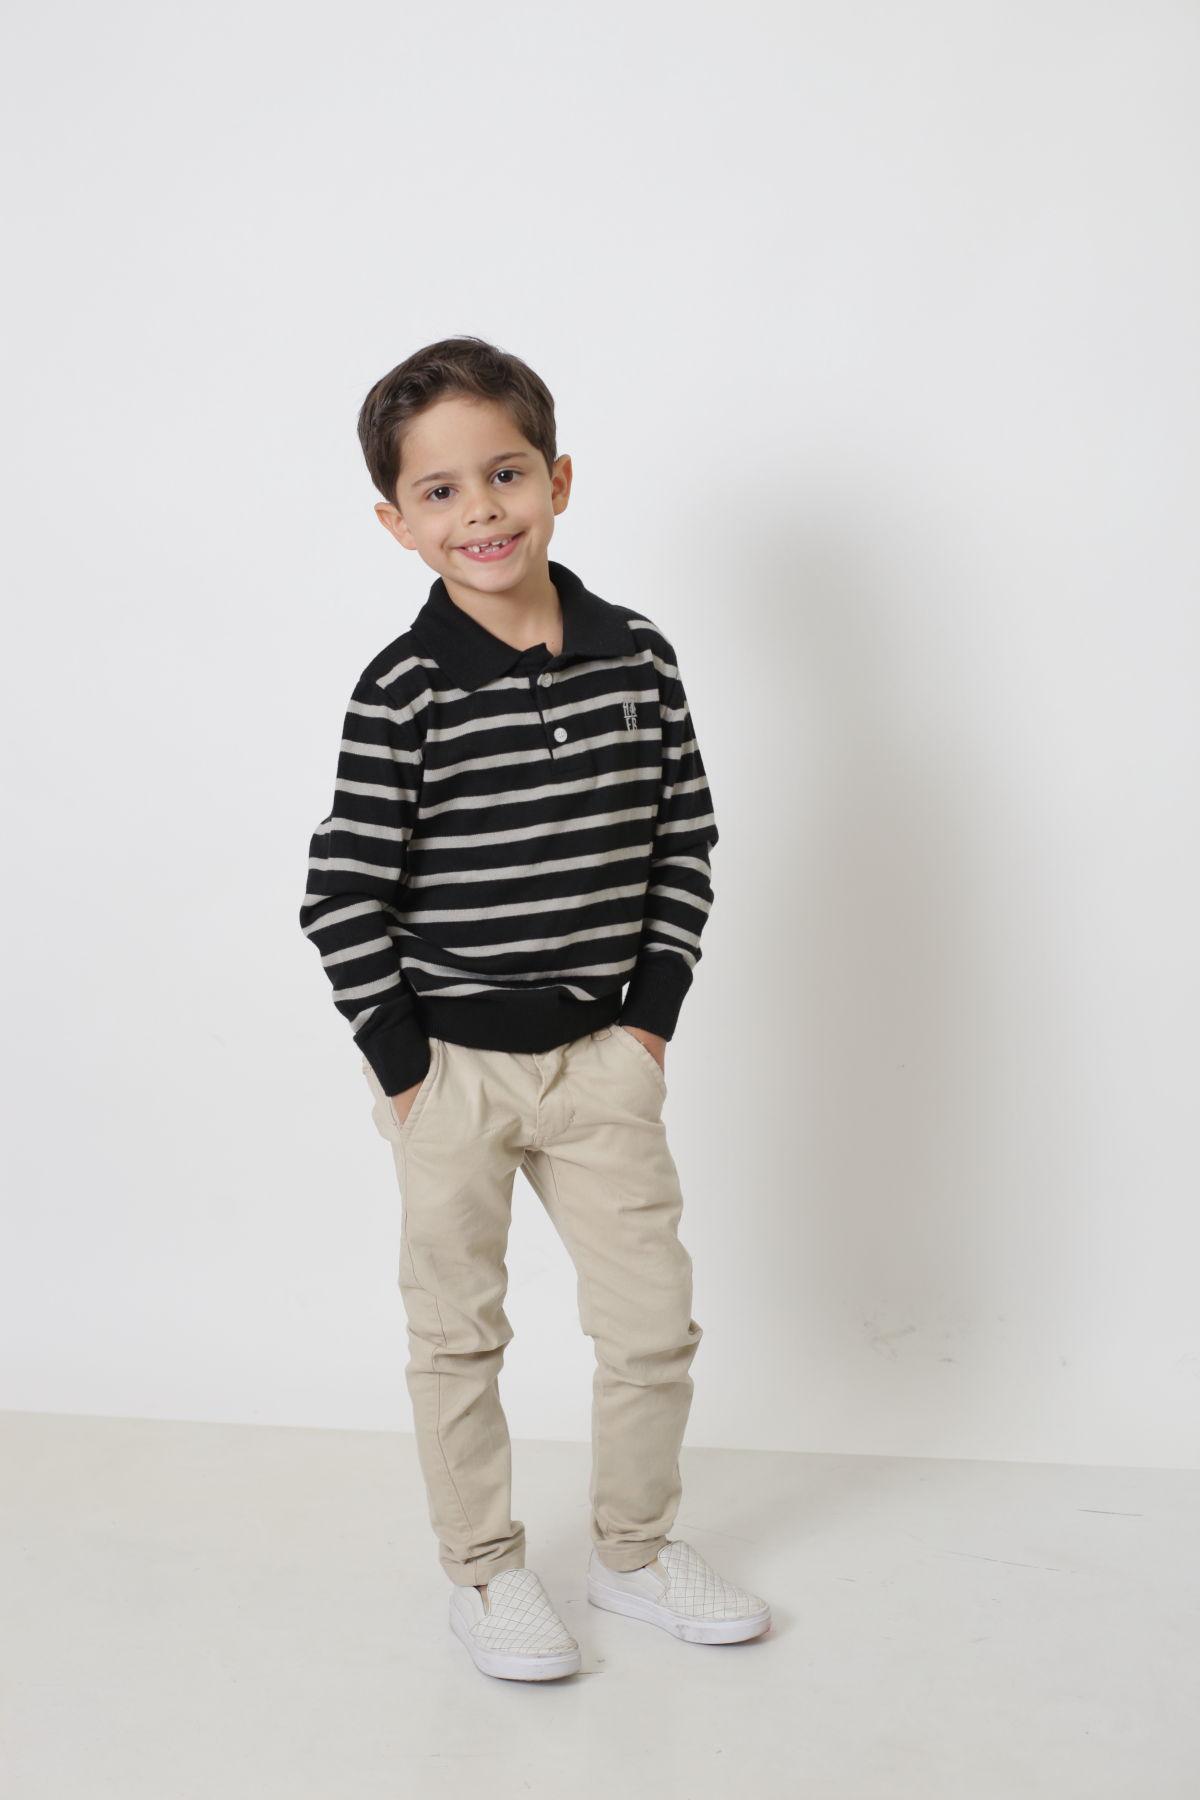 Camisa Polo Suéter Listrado Infantil  - Heitor Fashion Brazil